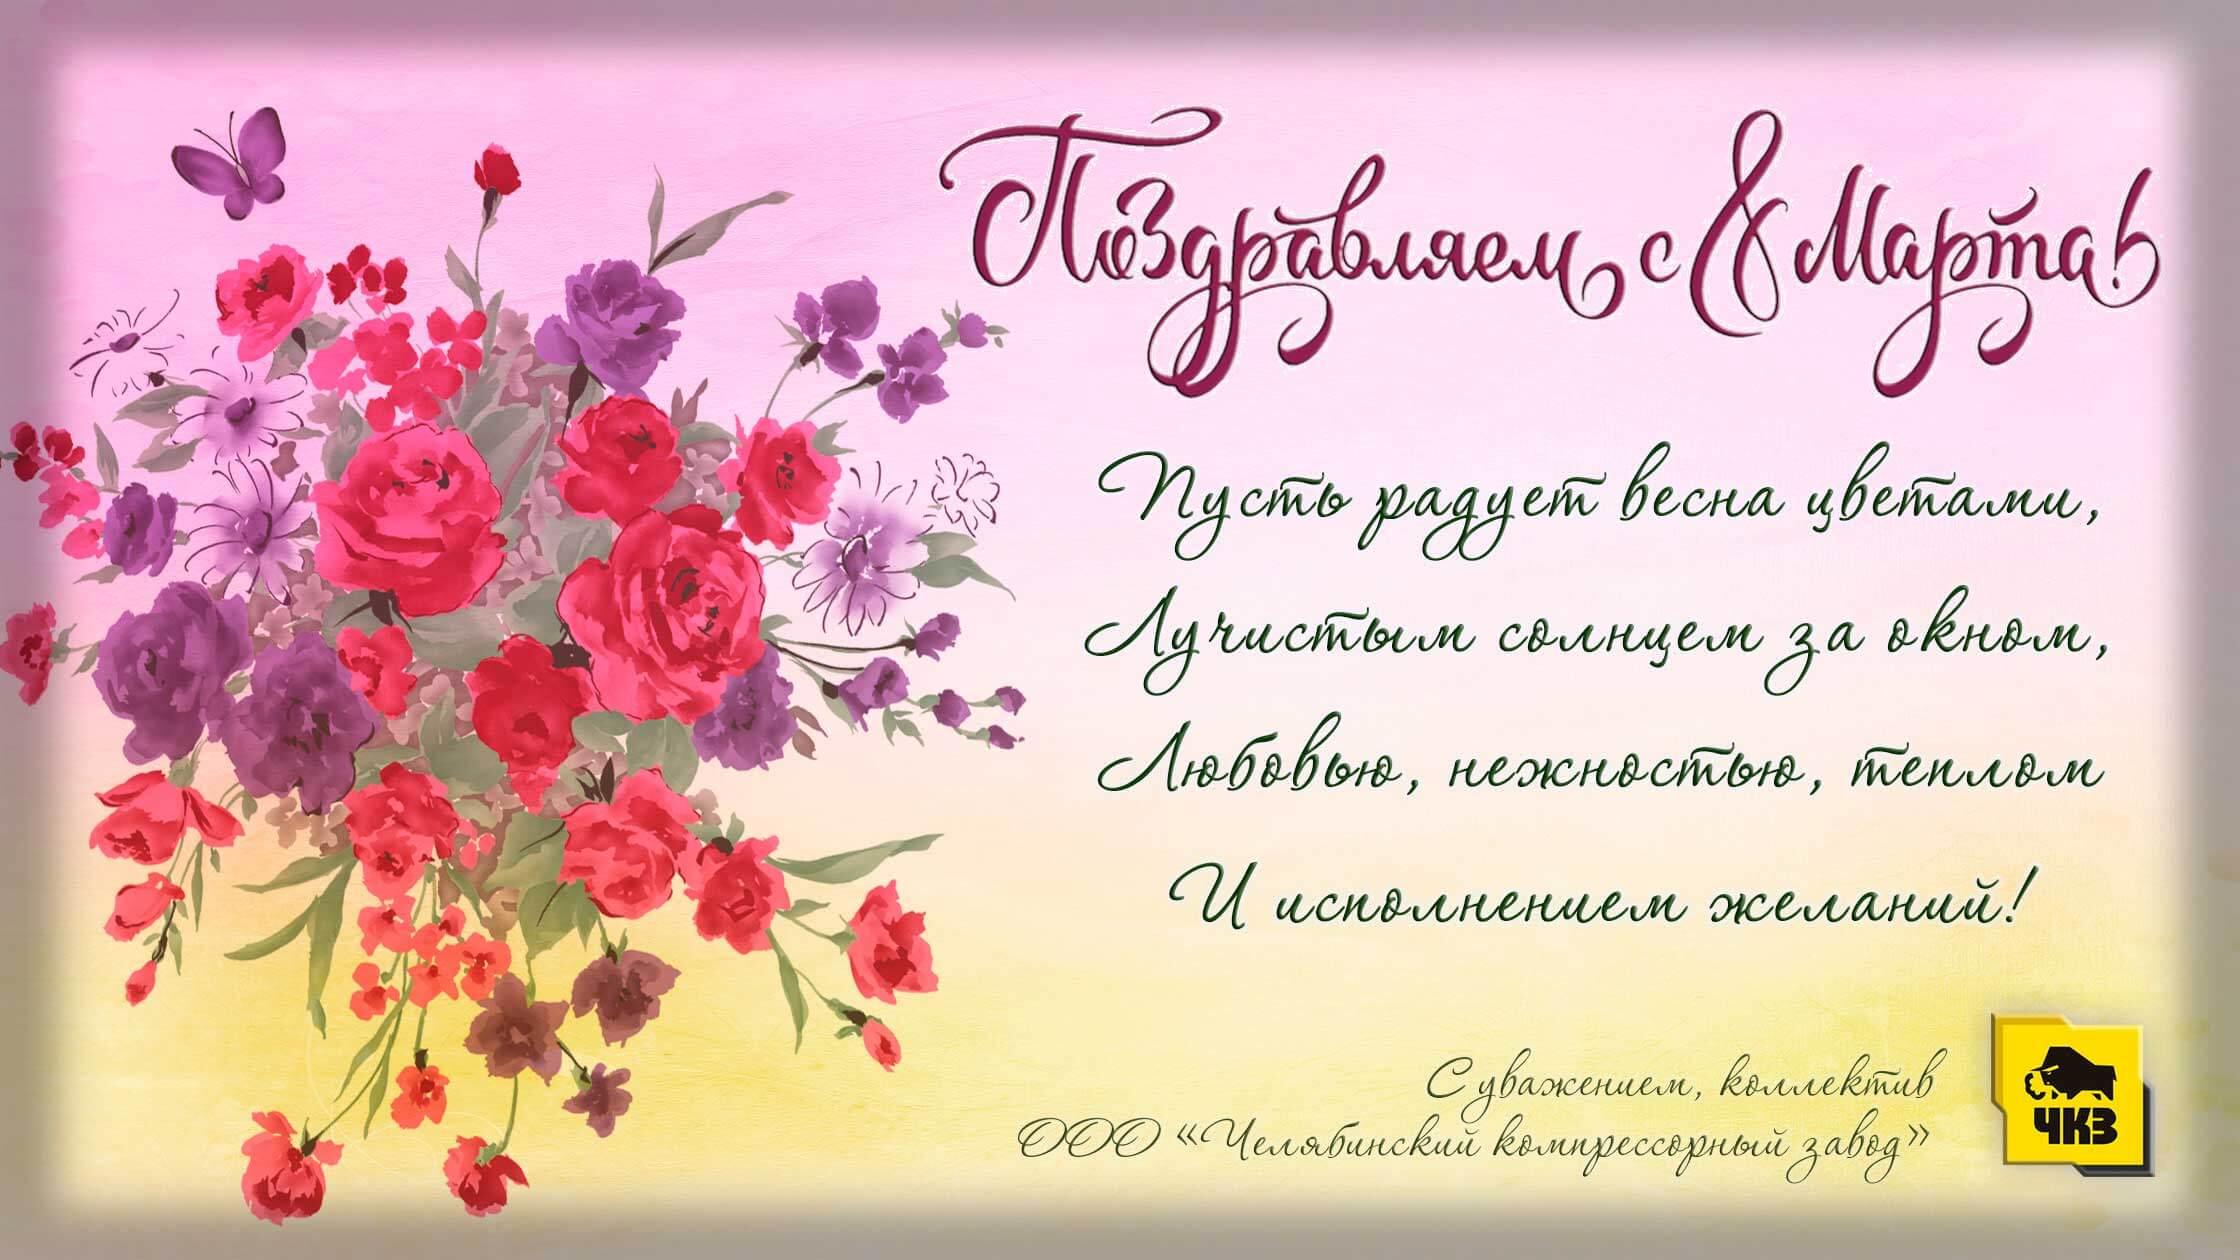 Женскому коллективу 16